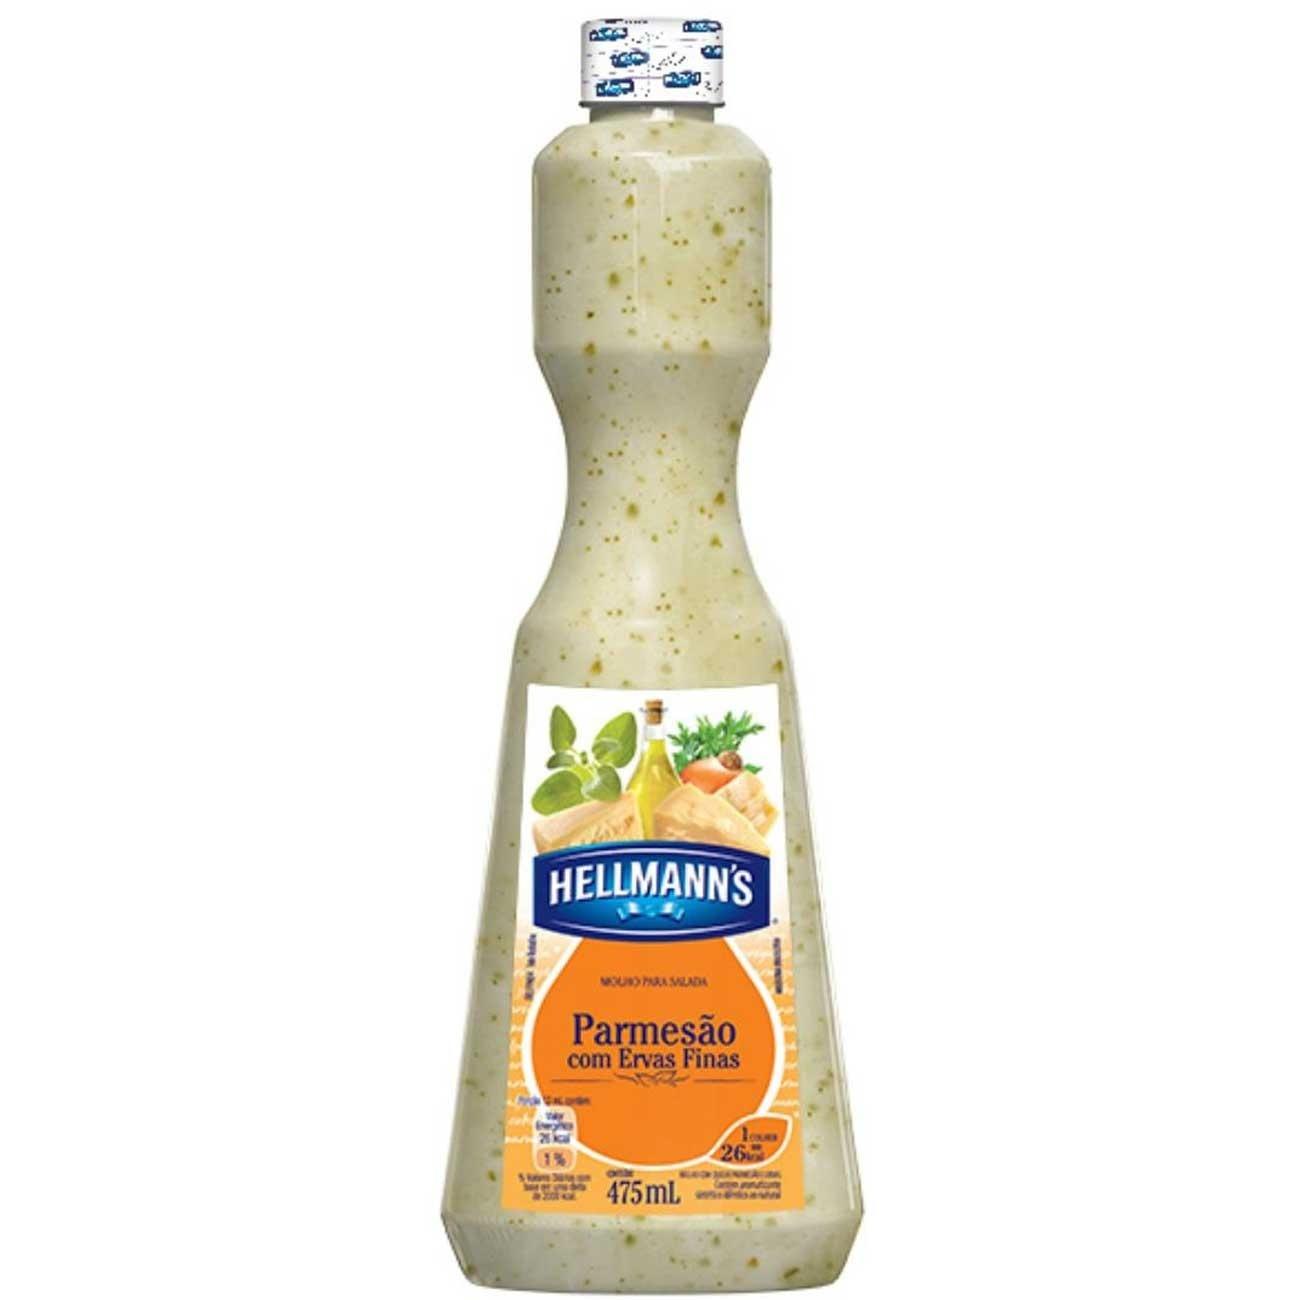 Molho para Salada Hellmann's Parmesão 475ml | 1 unidades